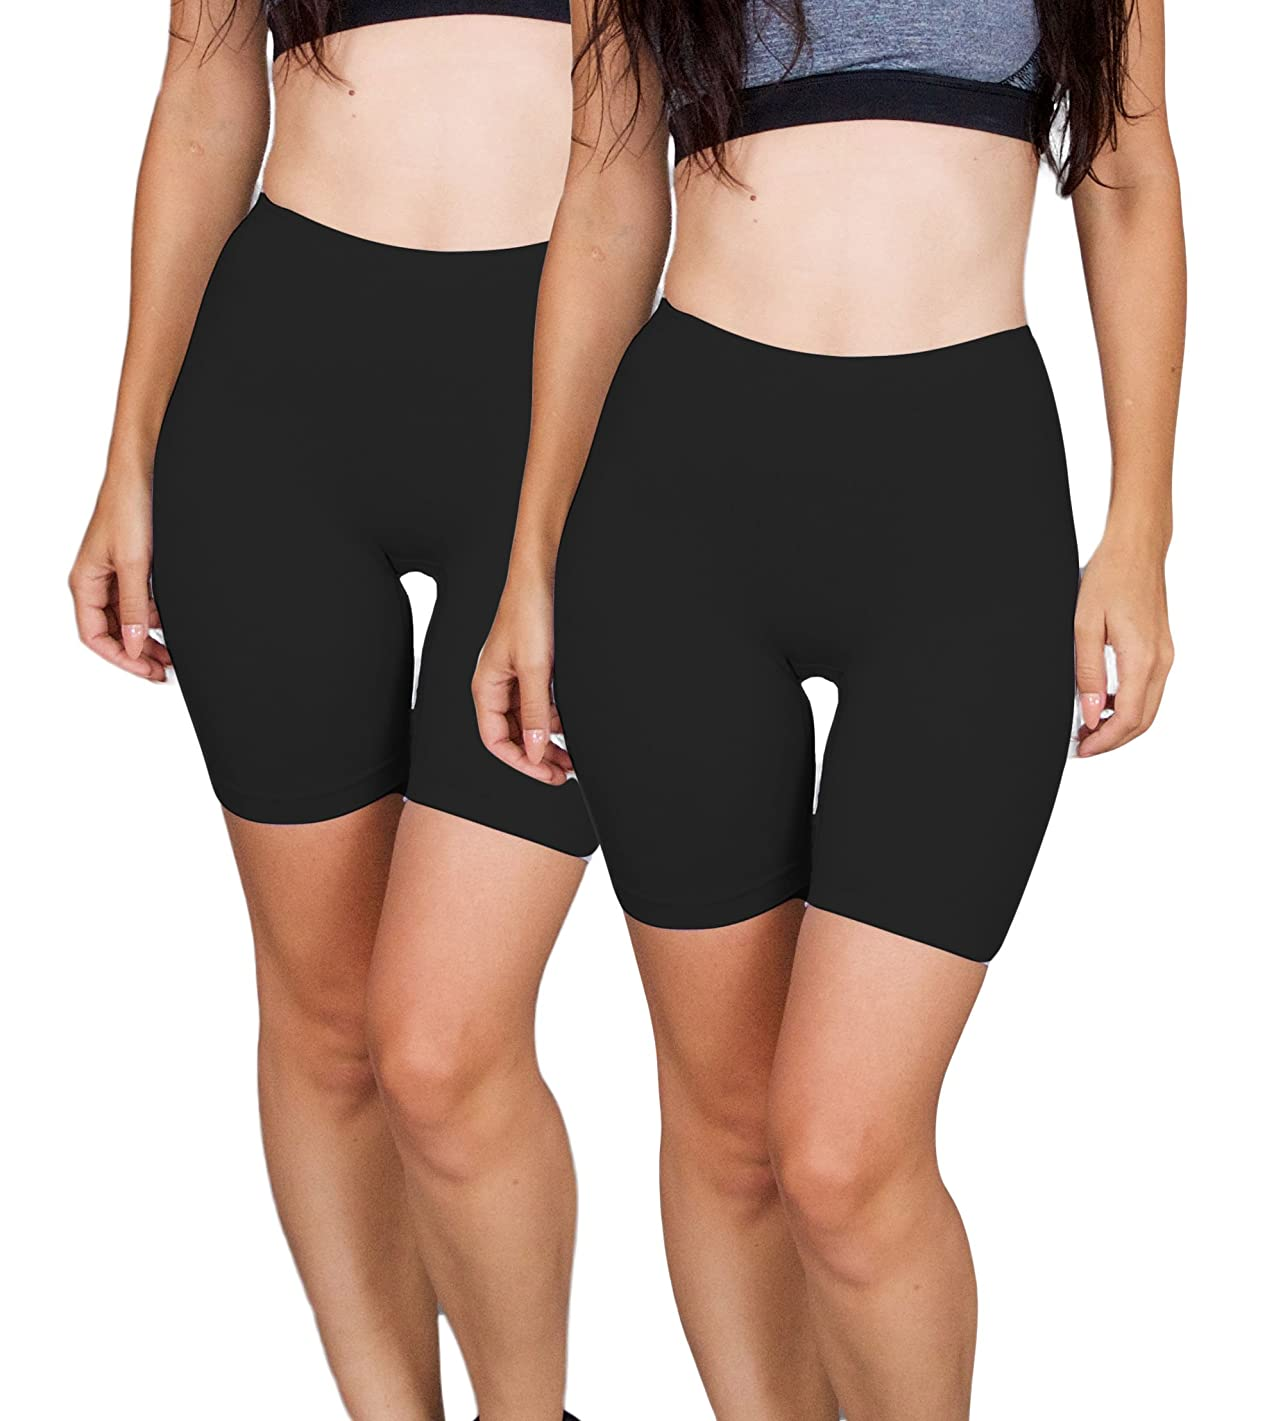 Emprella Bike Shorts Women, 2-Pack Spandex Biker Short for Yoga Gym Biking or Slip Shorts